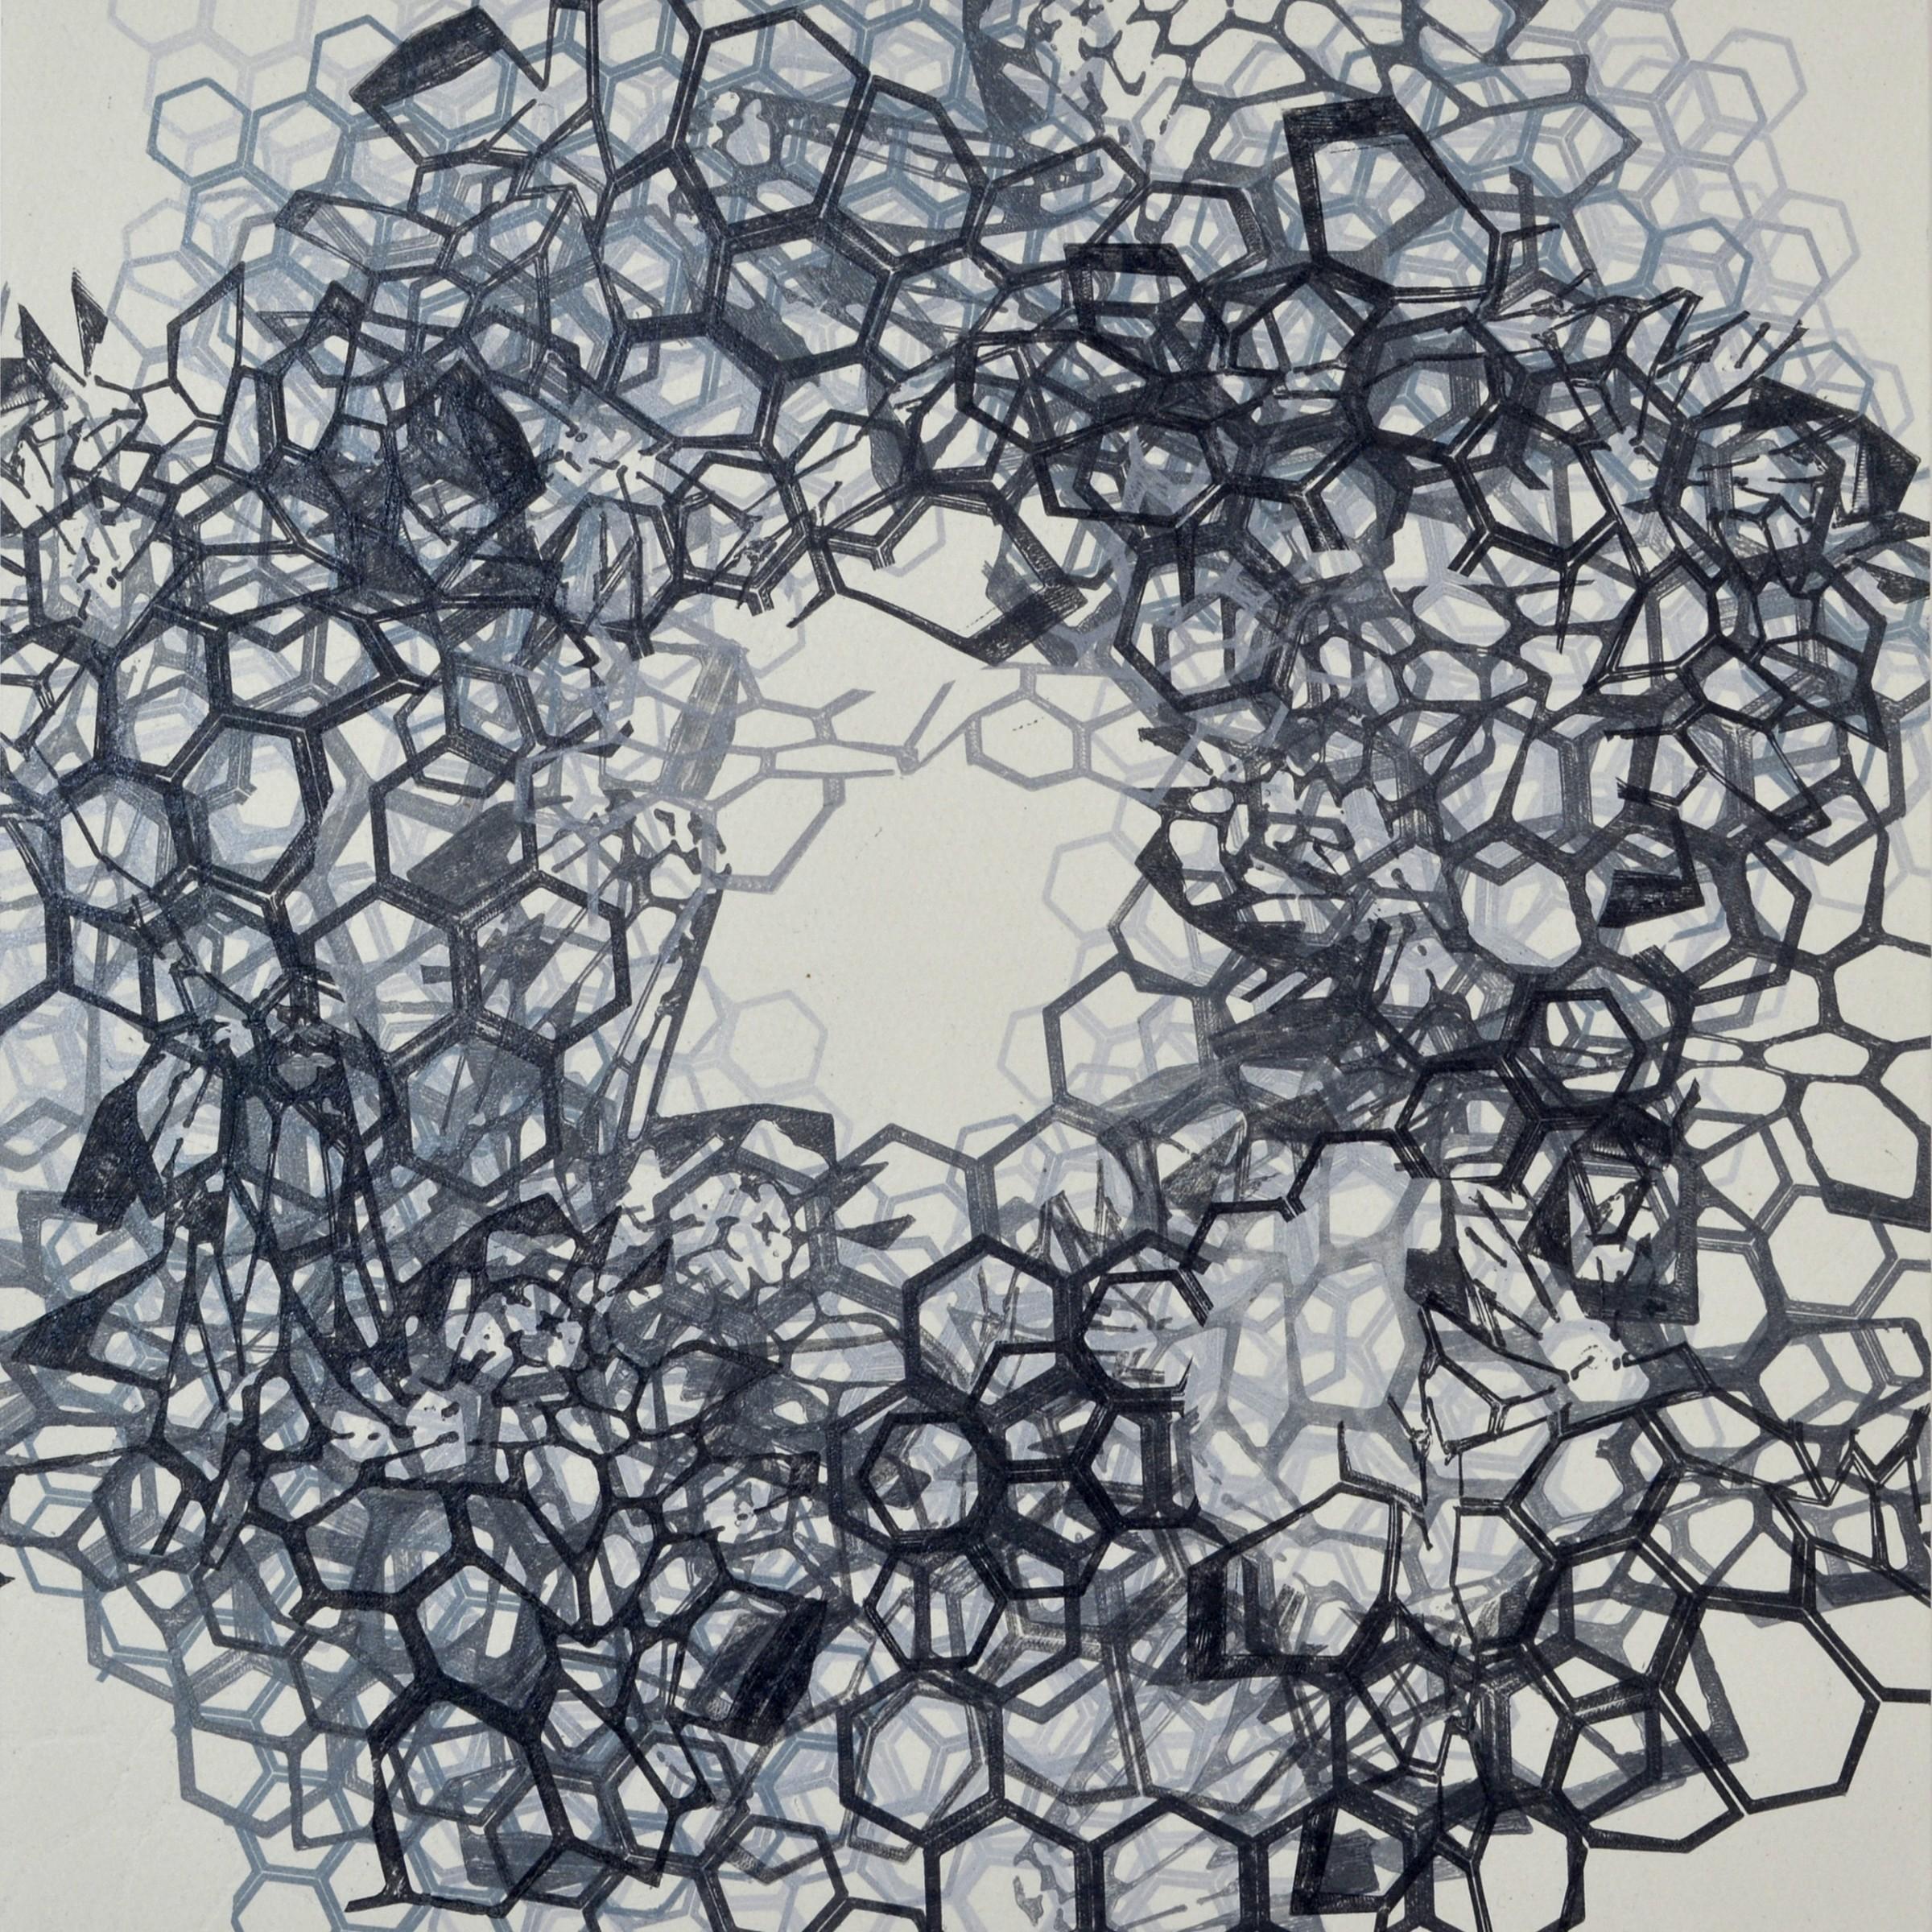 "<span class=""link fancybox-details-link""><a href=""/exhibitions/17/works/image_standalone643/"">View Detail Page</a></span><p><strong>Doug Burton</strong></p><p>Morphology</p><p>relief monoprint</p><p>46 x 46cm</p><p>£850 framed</p>"